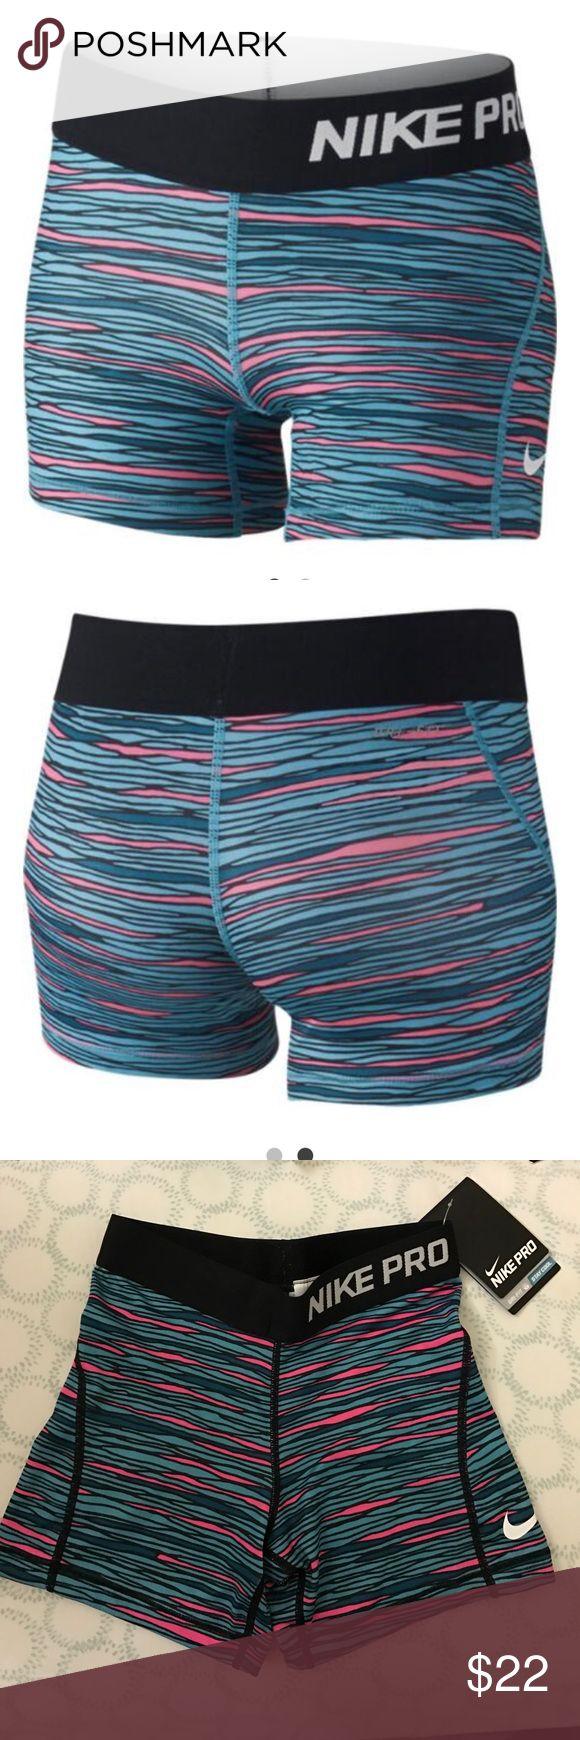 Girls Nike Pro shorts Brand new. Unworn. Nike Bottoms Shorts